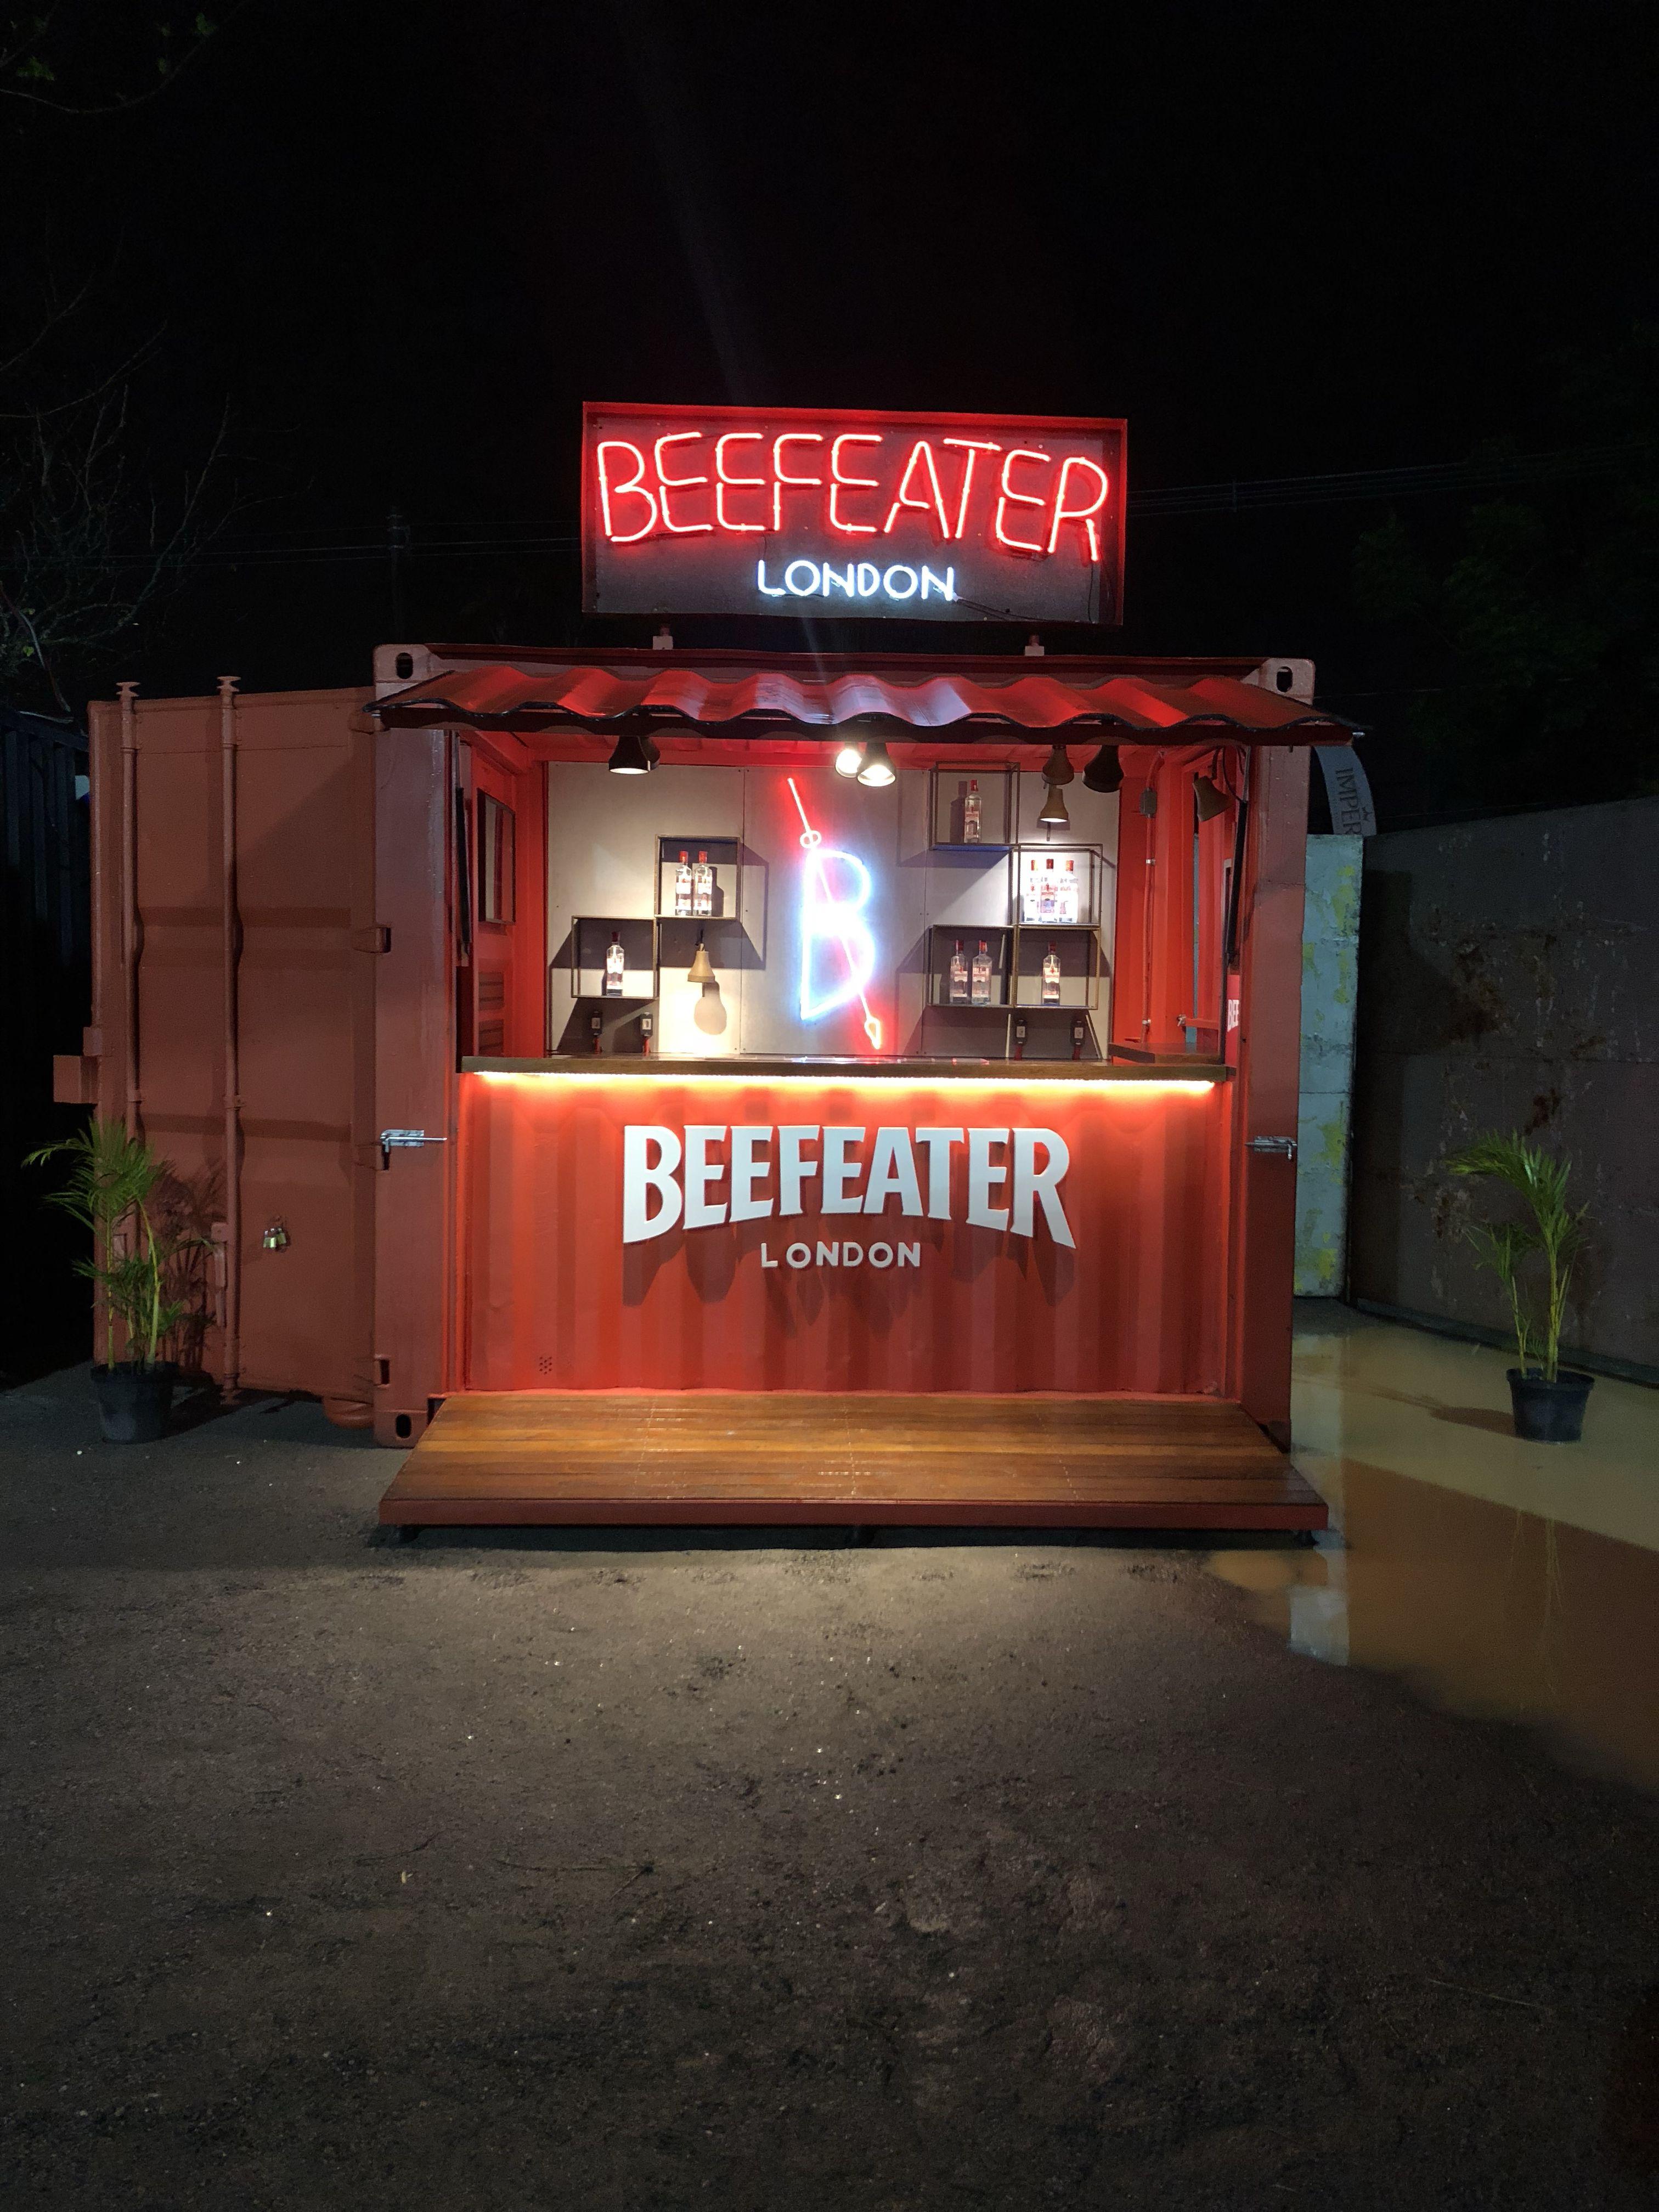 Container Baby 10 Beefeater Bar Desain Restoran Kedai Kopi Truk Makanan